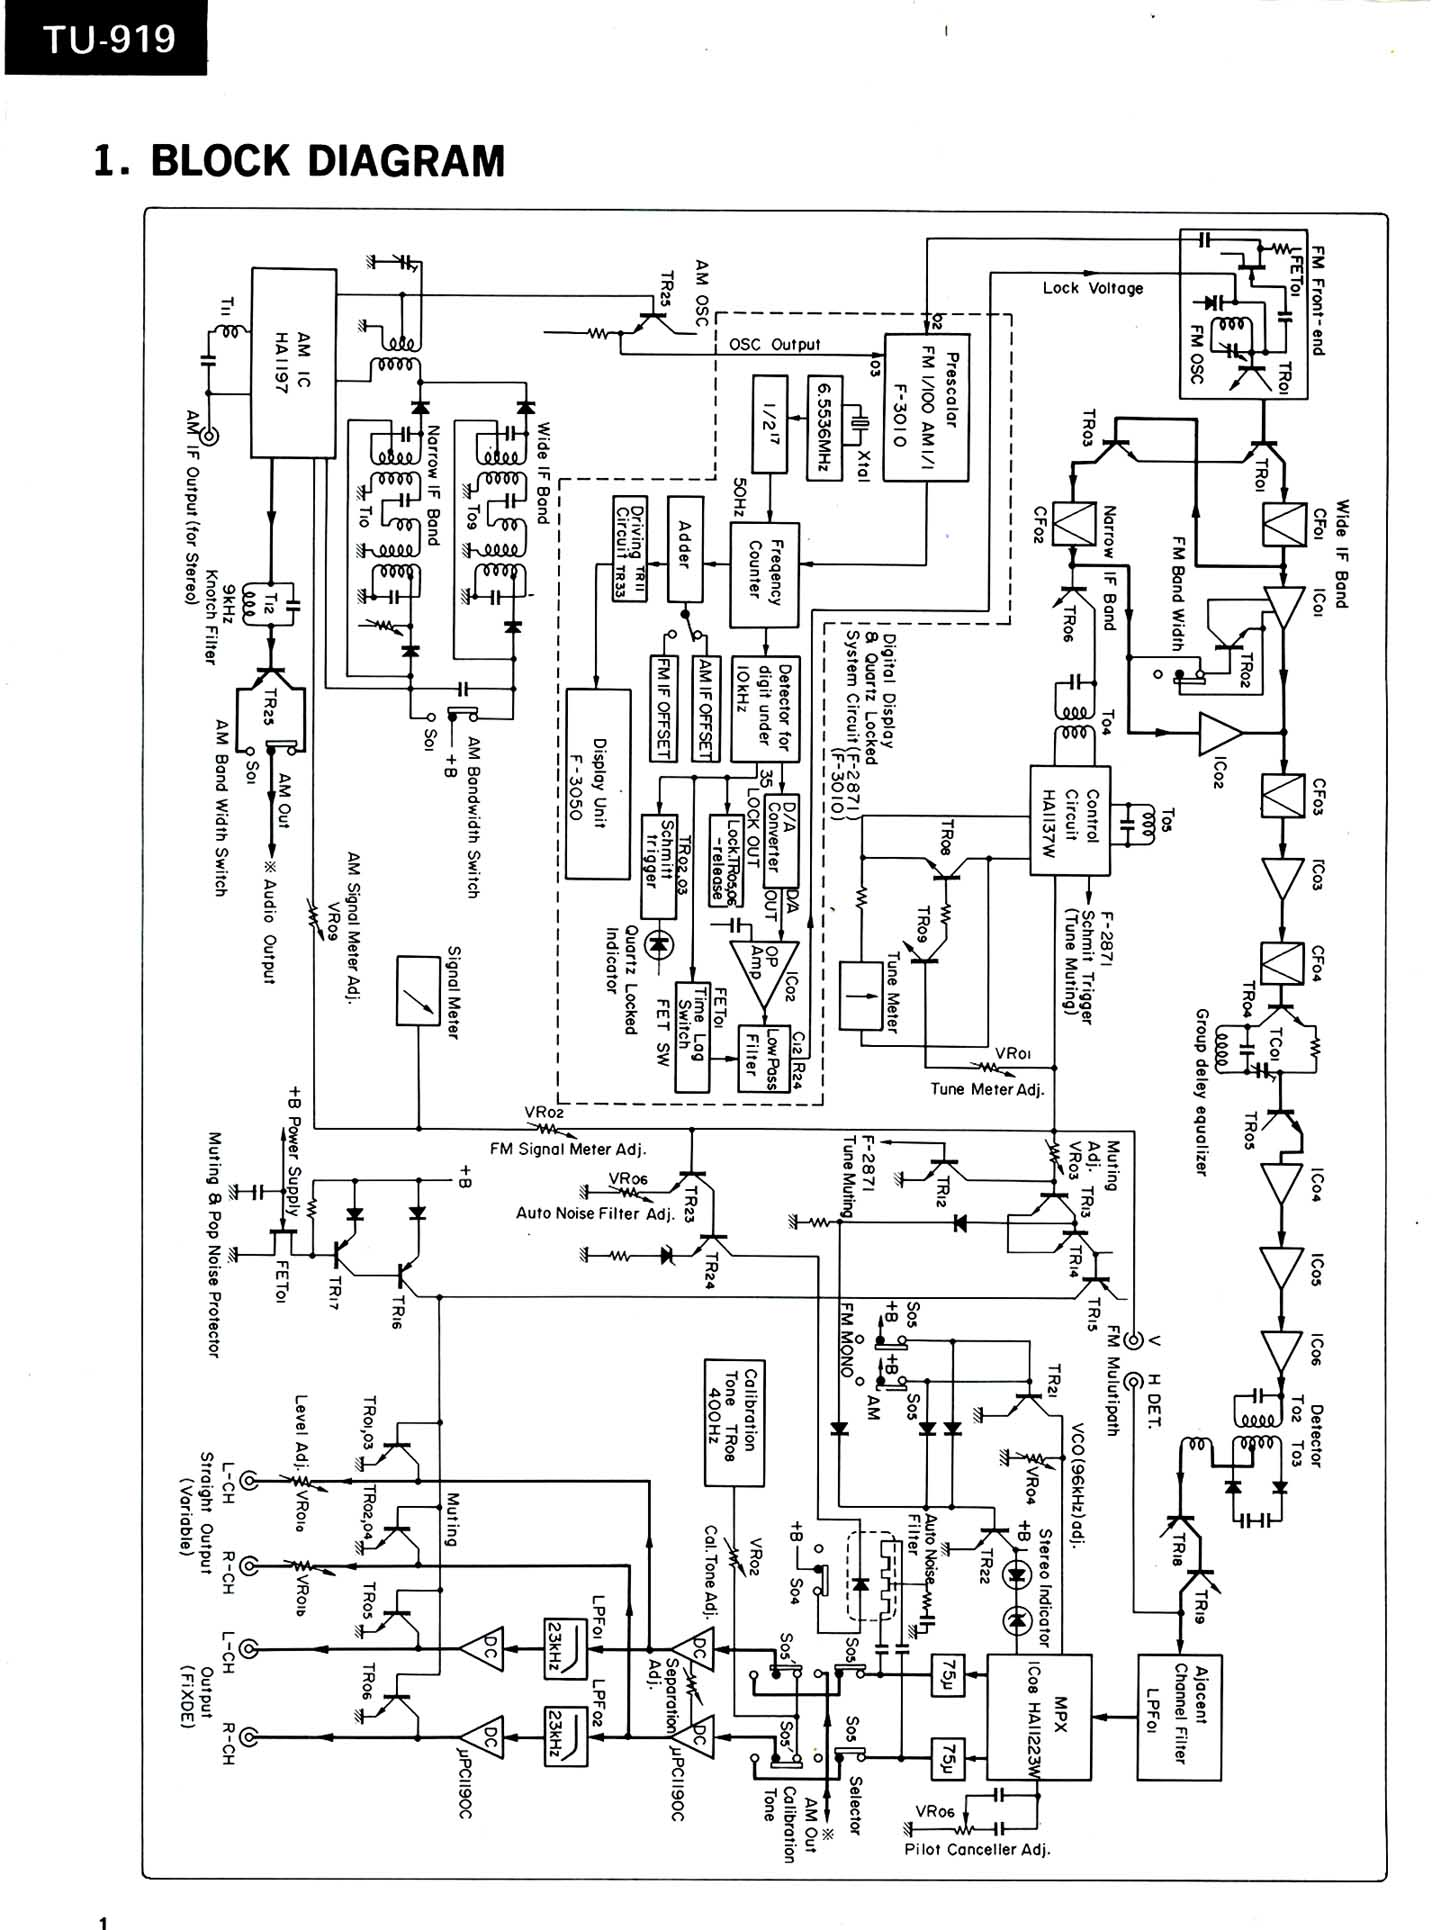 www fmtunerinfo com  sansui html electric wiring diagram electric wiring diagram electric wiring diagram electric wiring diagram